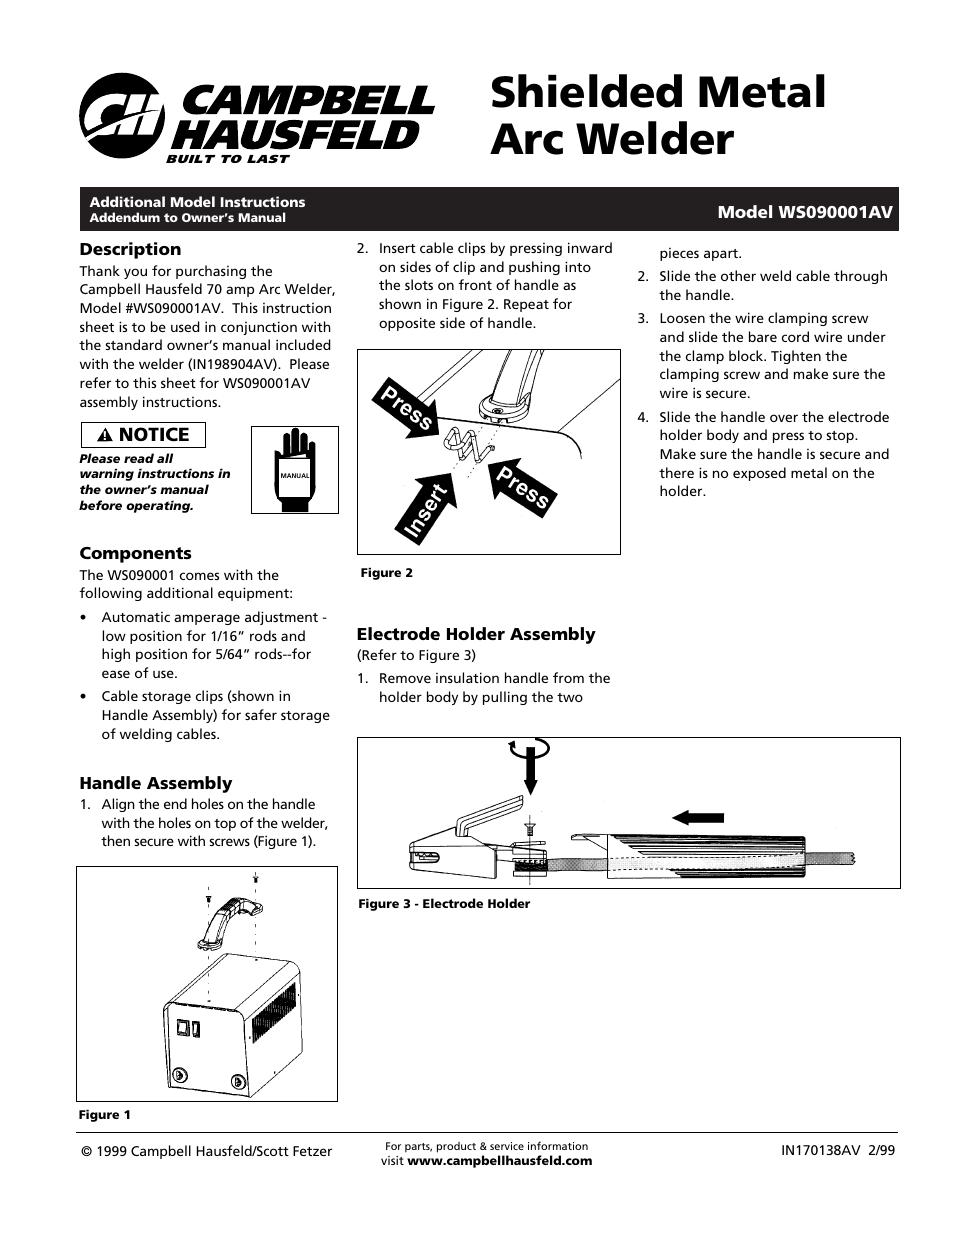 campbell hausfeld 70 amp arc welder manual